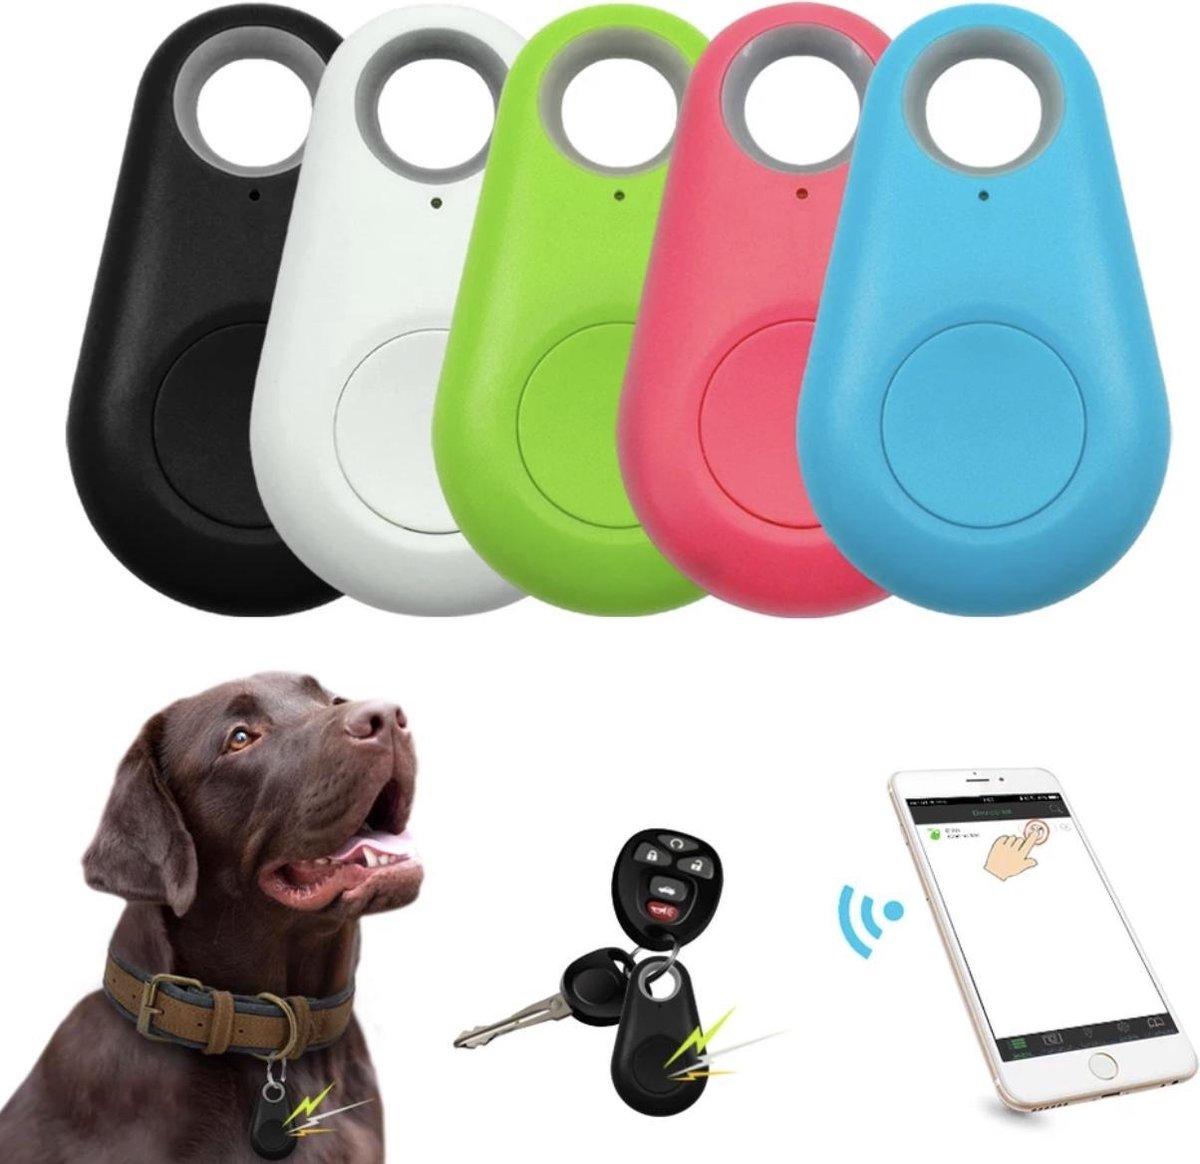 Bluetooth gps tracker - GPS tracker met voicerecorder - Sleutelhanger tracking volg systeem voor kind / hond / kat / bagage inclusief alarmfunctie / sleutelvinder / zwarte